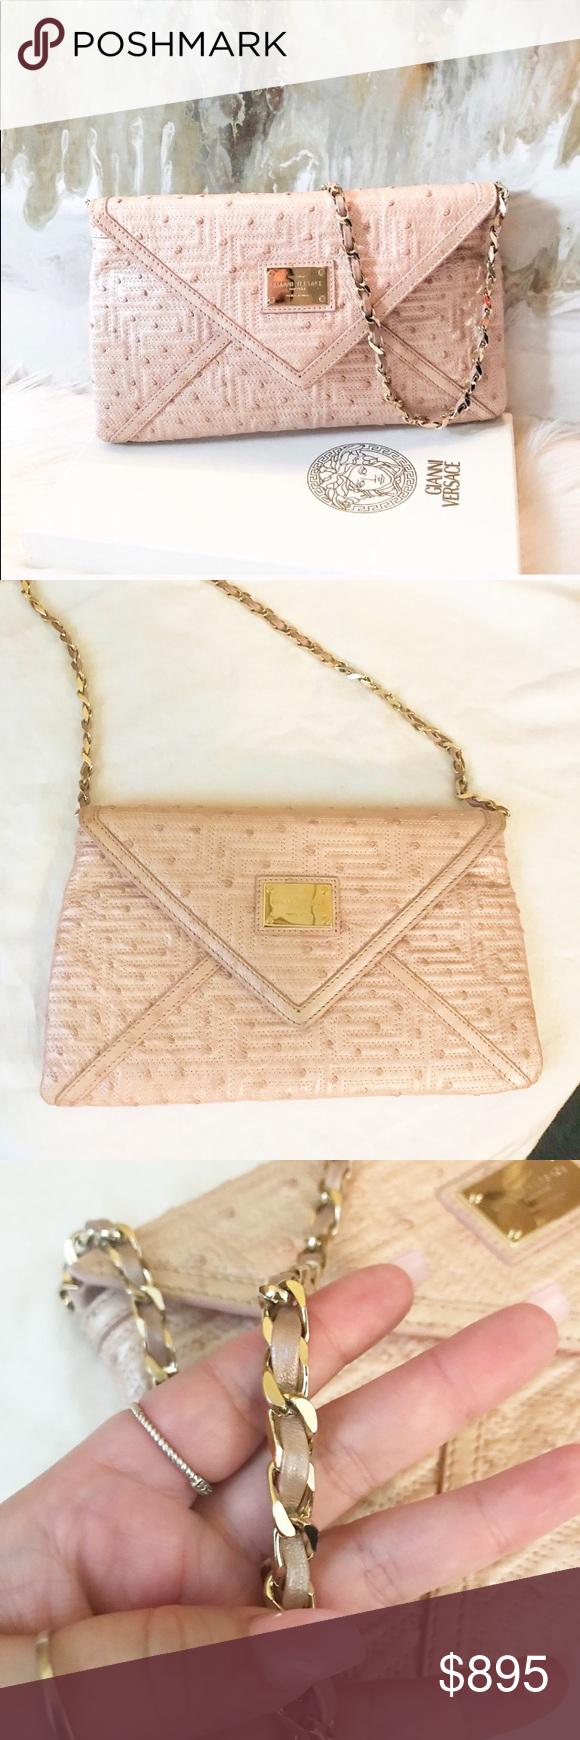 e71369745921 Versace RARE Couture Pearl Ostrich Chain Bag Auth. Gianni Versace Rare Ostrich  Envelope